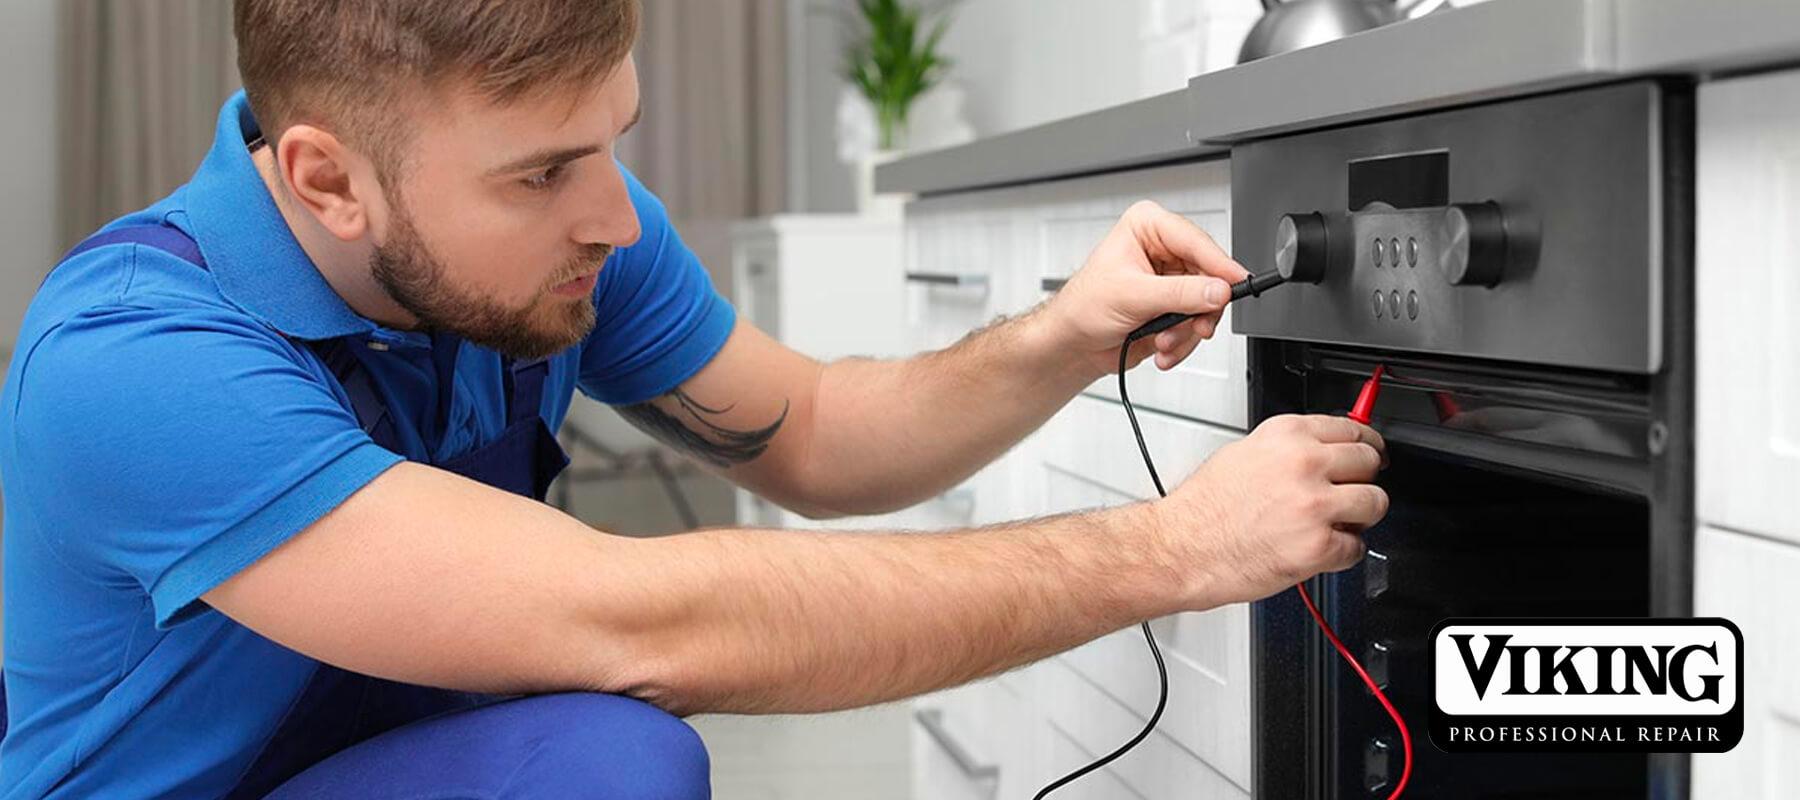 Authorized Viking Appliance Repair Service Palm Springs | Professional Viking Repair